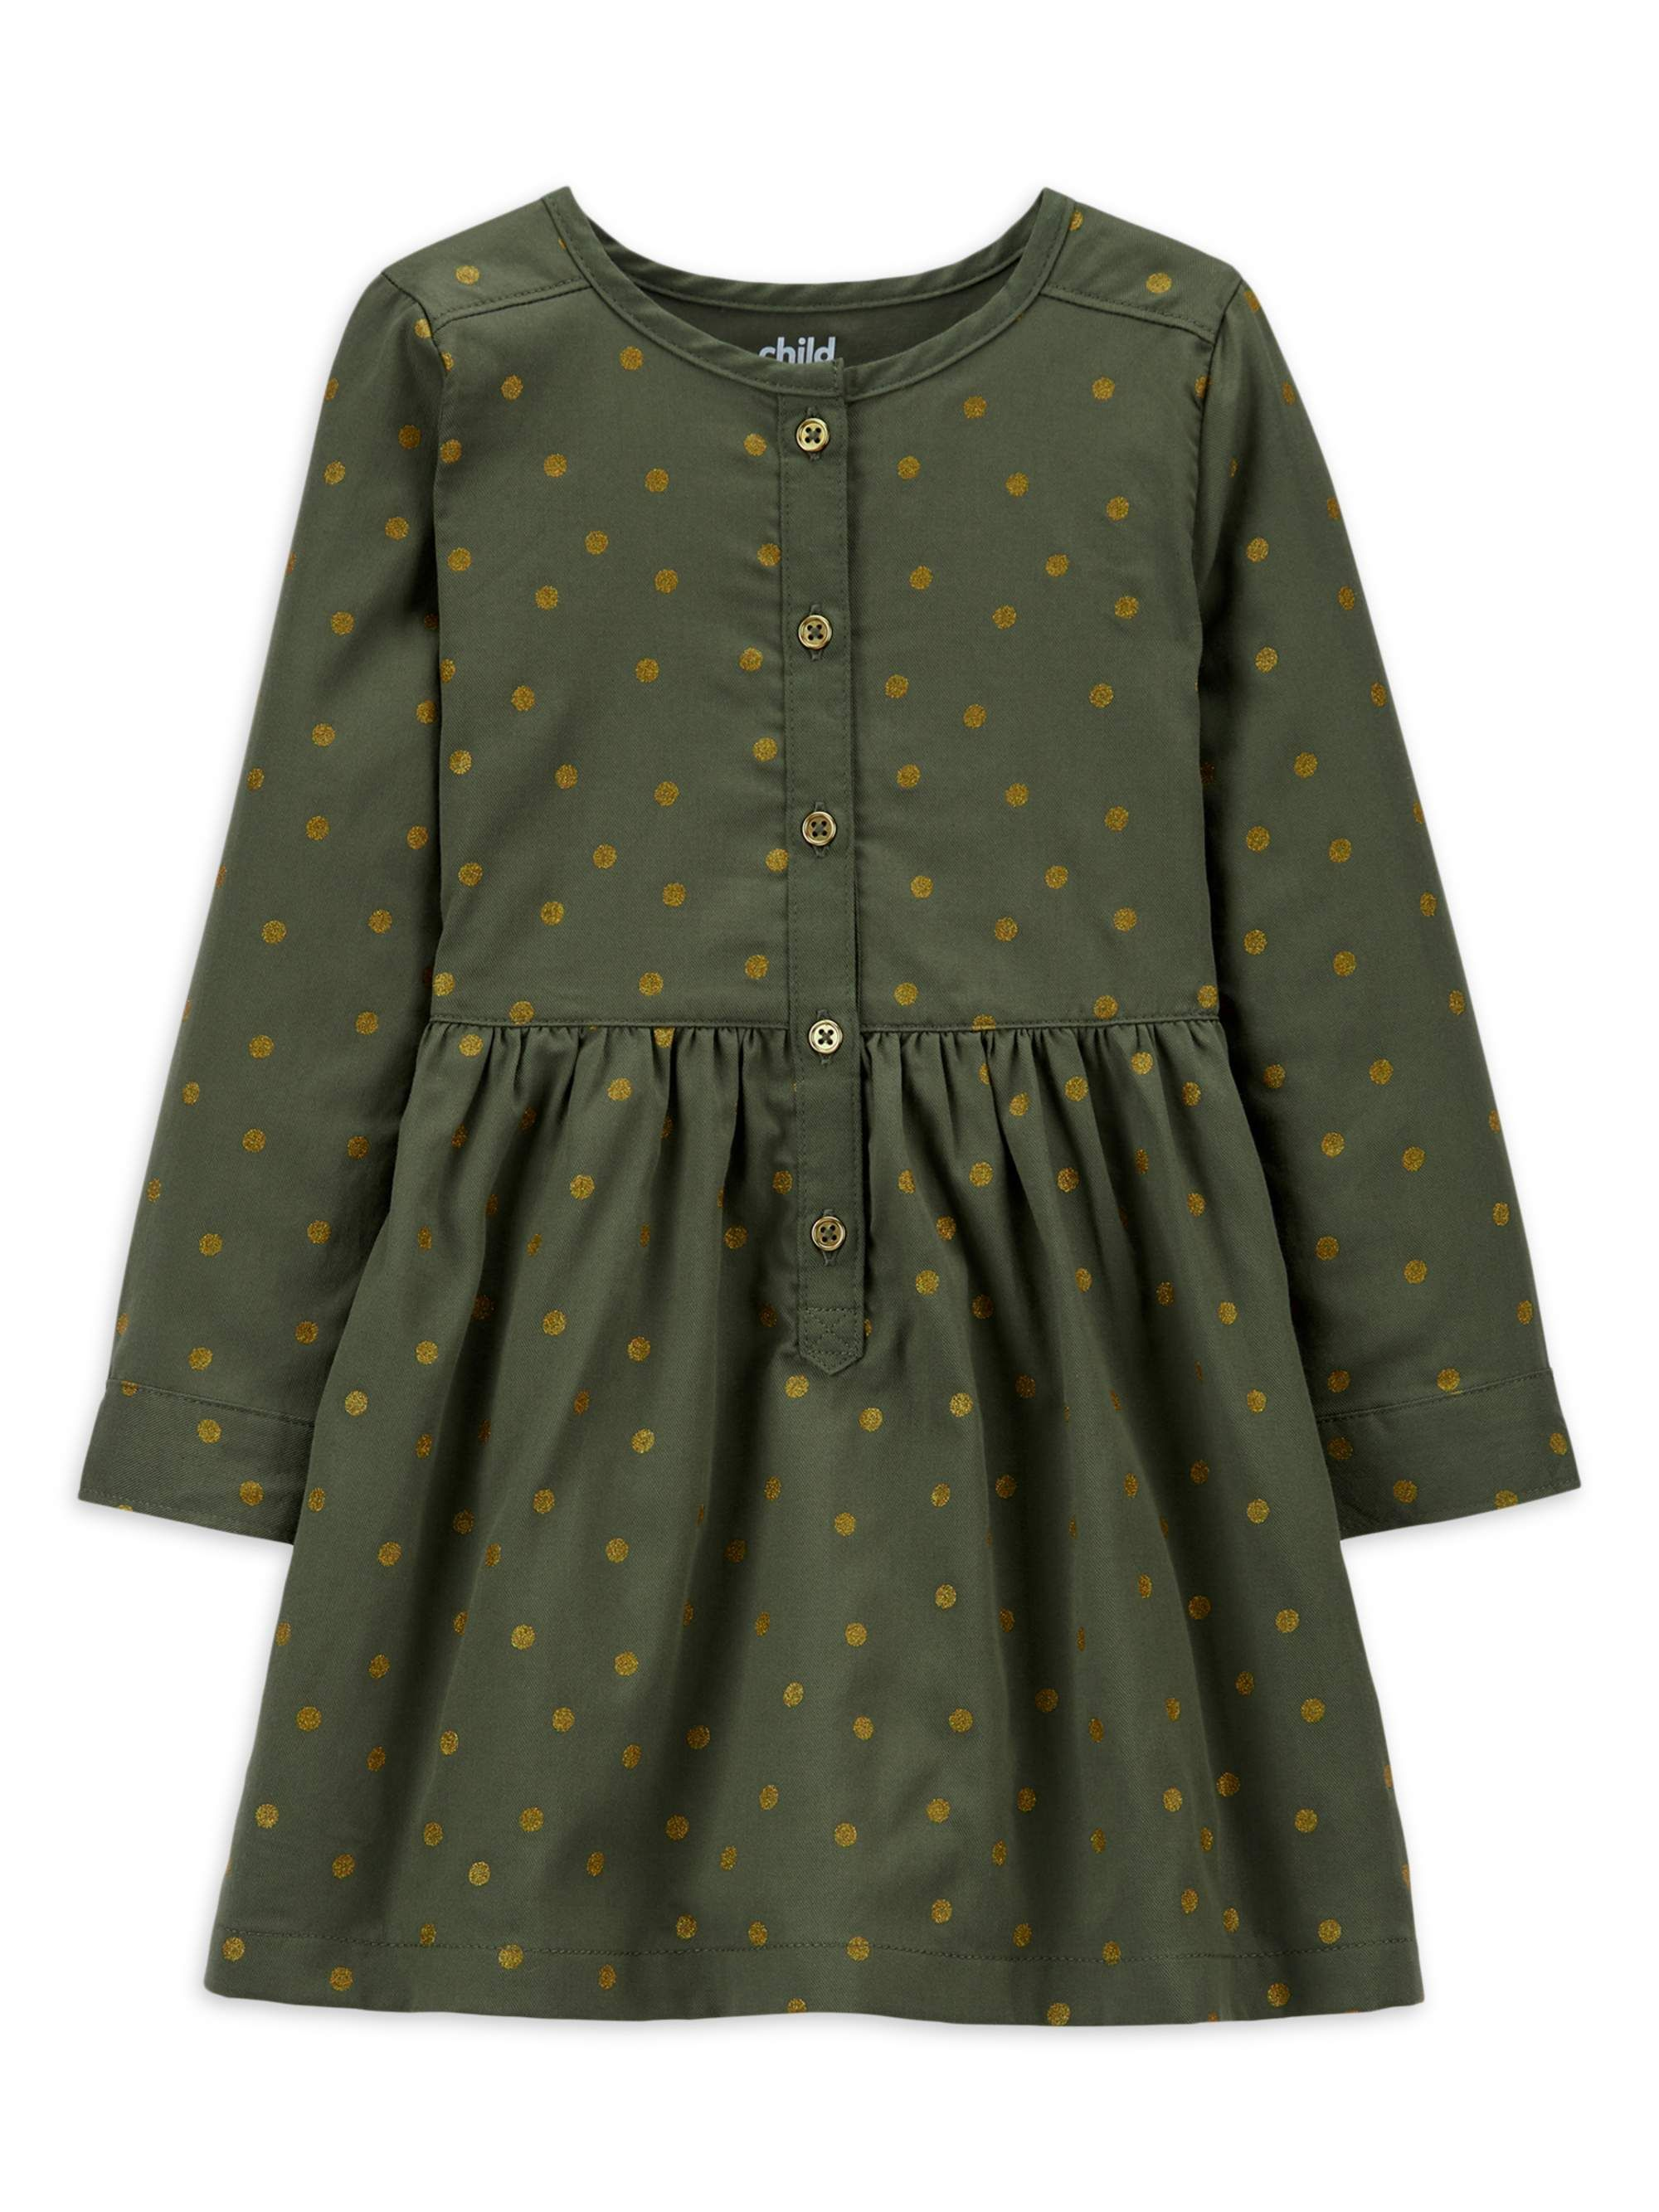 Child Of Mine By Carter S Child Of Mine By Carter S Baby Toddler Girls 3 4 Sleeve Knit Dress Sizes 12m 5t Walmart Com In 2021 Toddler Girl Dresses Cute Little Girl [ 2667 x 2000 Pixel ]